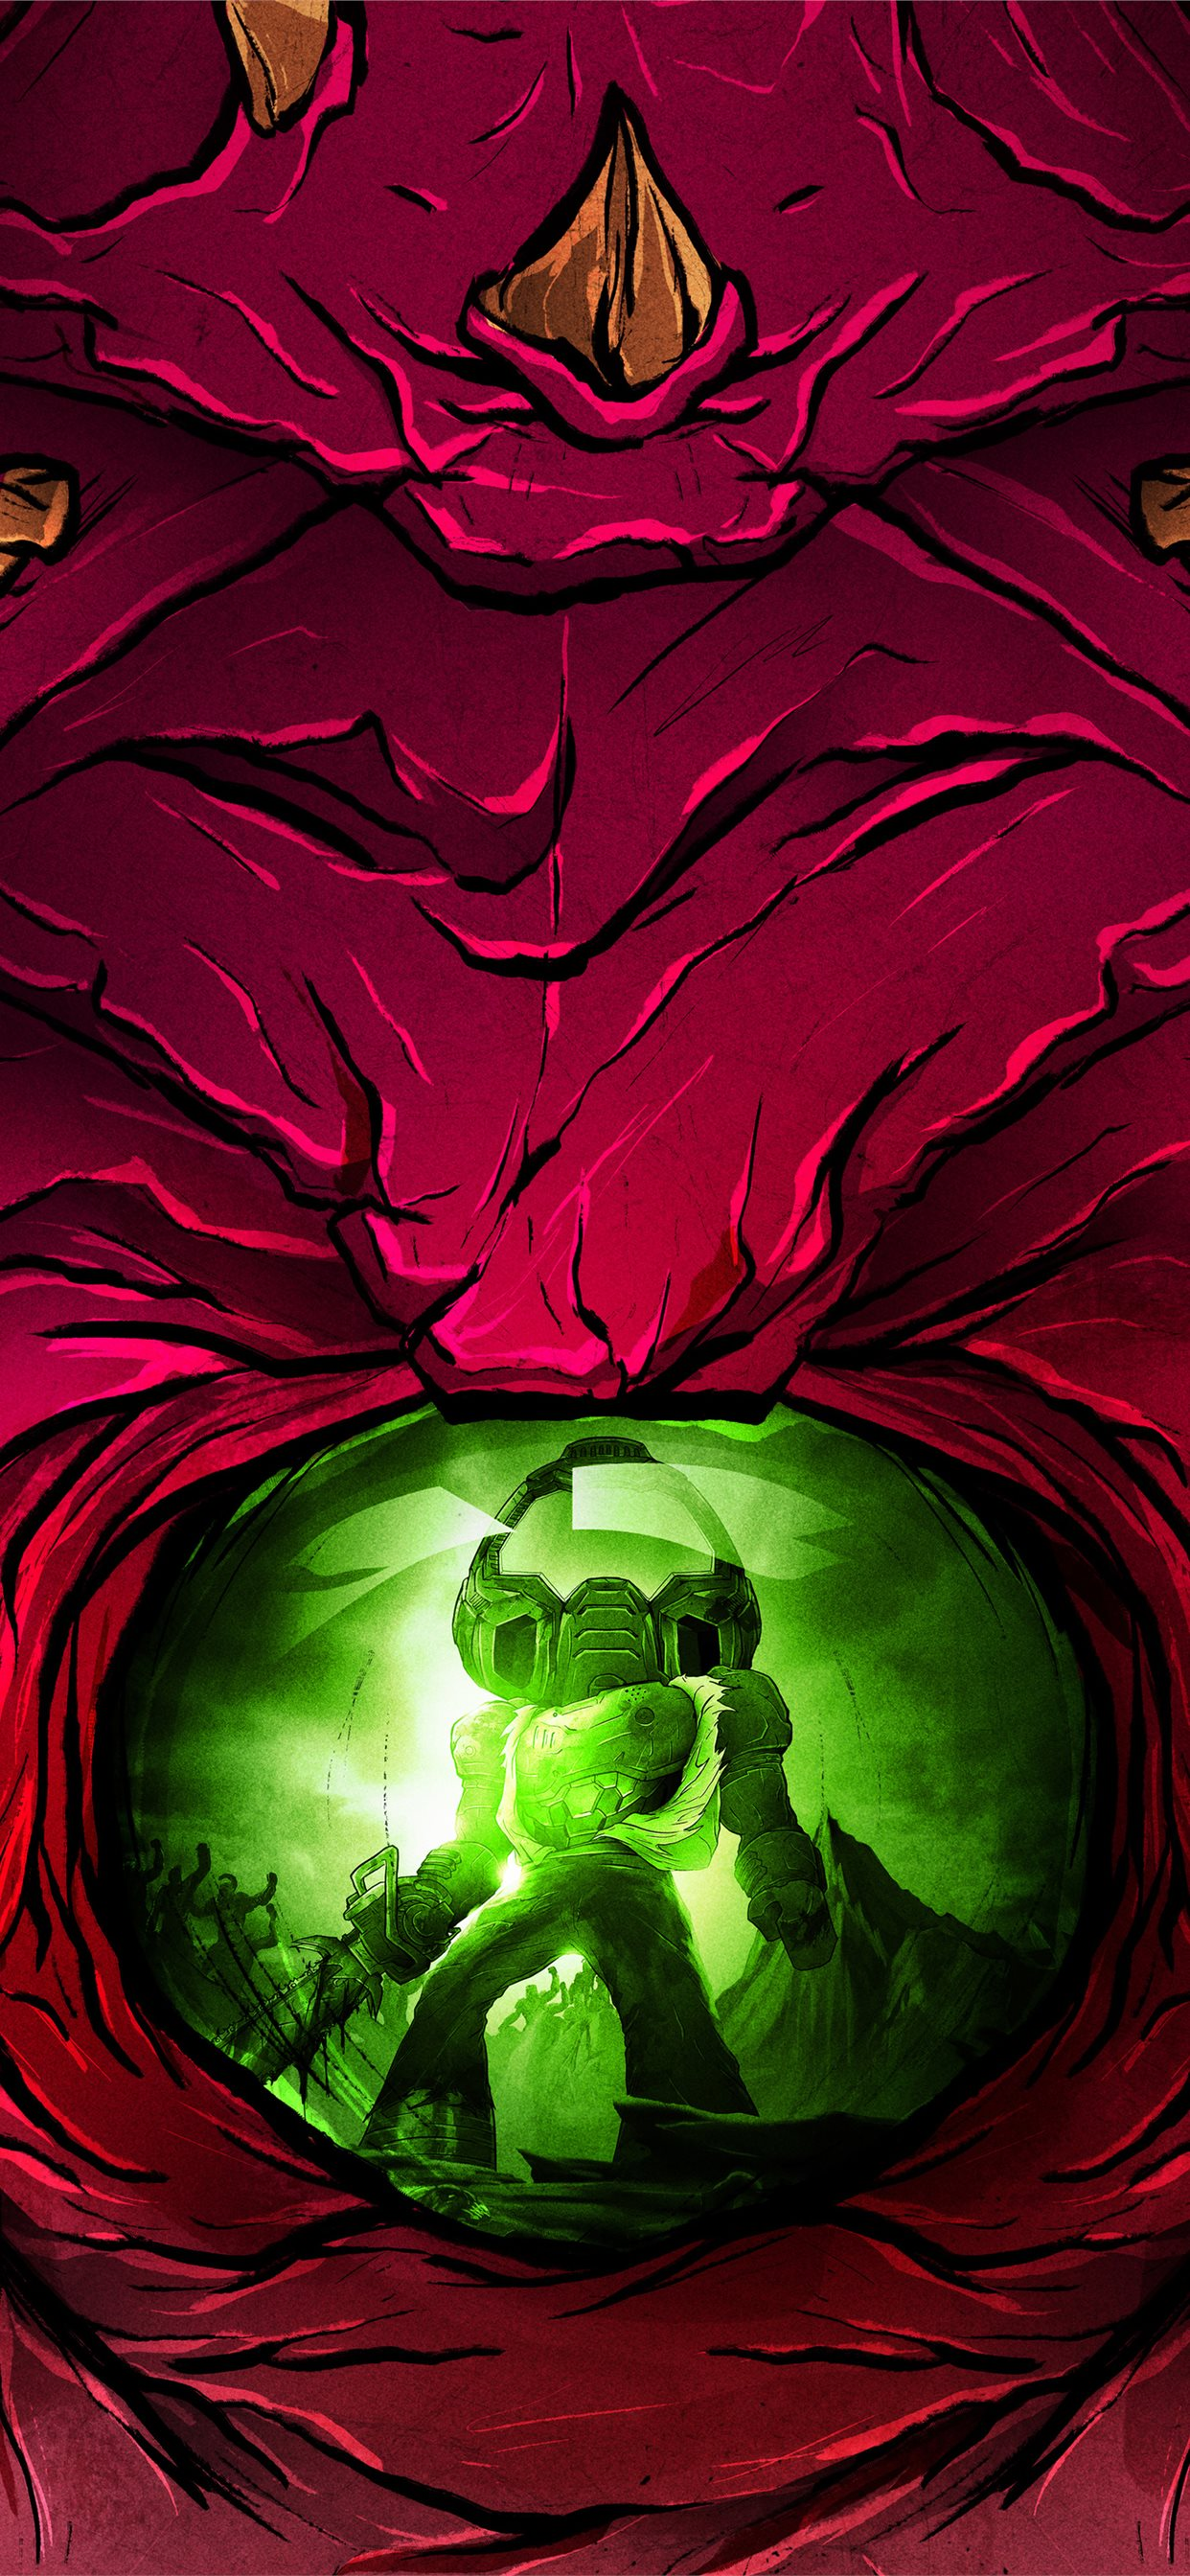 Doom Eternal Slayerclub Starship Doomers 5k Iphone Wallpapers Free